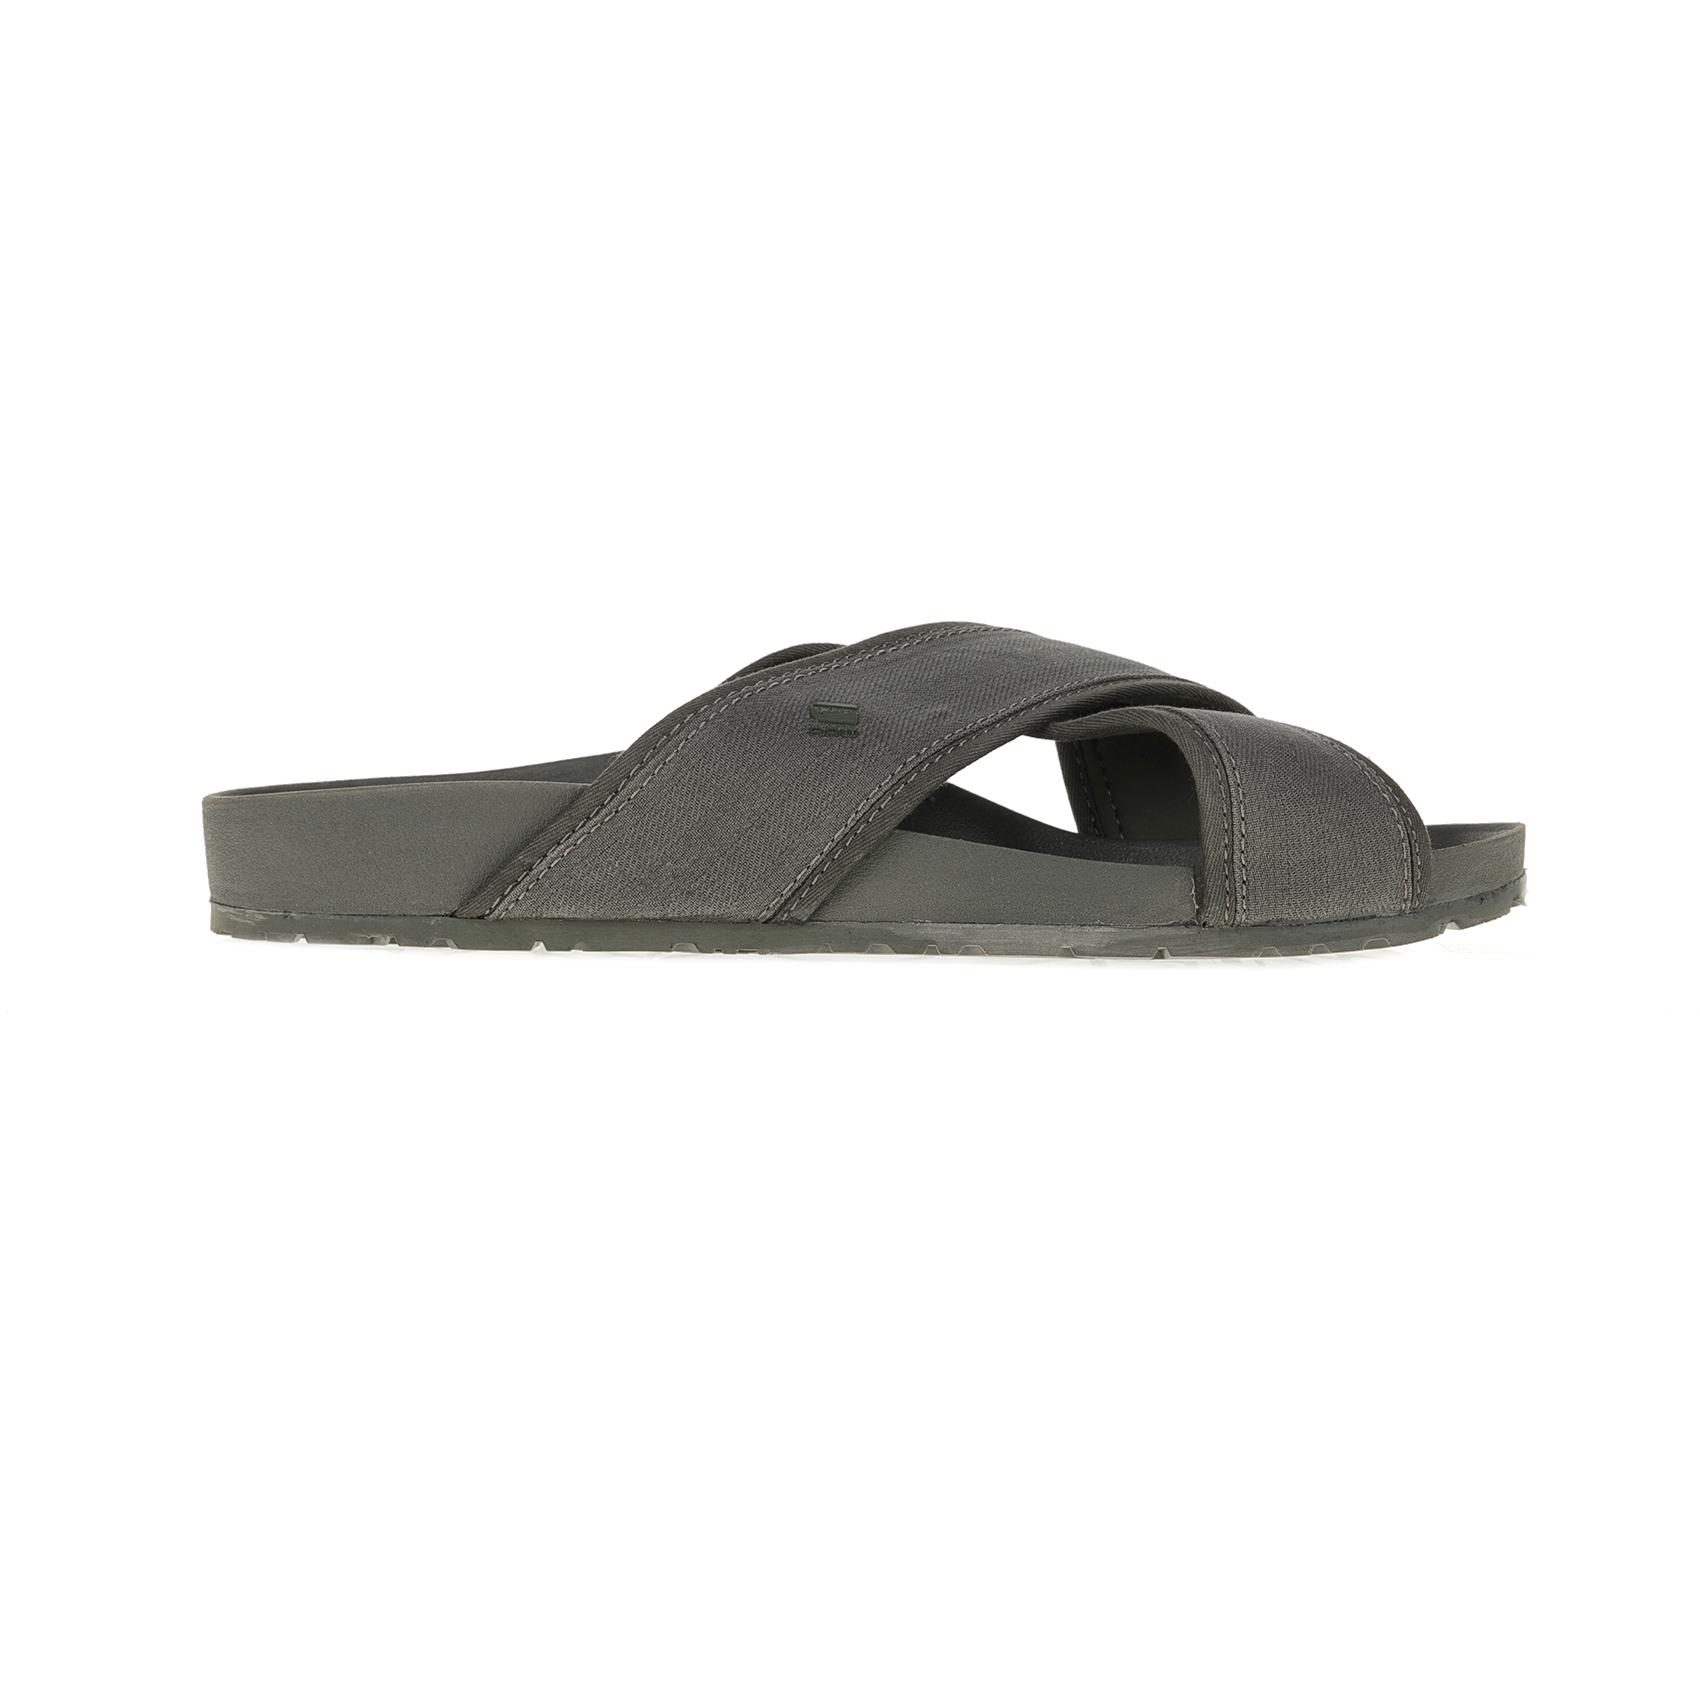 G-STAR RAW - Ανδρικές παντόφλες G-STAR NETROL STRAP χακί ανδρικά παπούτσια παντόφλες